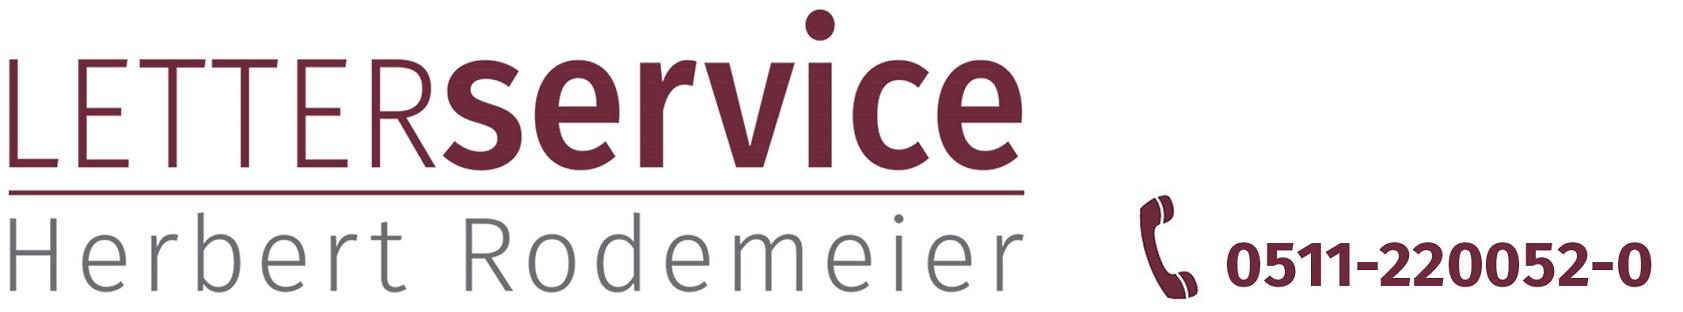 Logo Letterservice Herbert Rodemeier - Lettershop Hannover